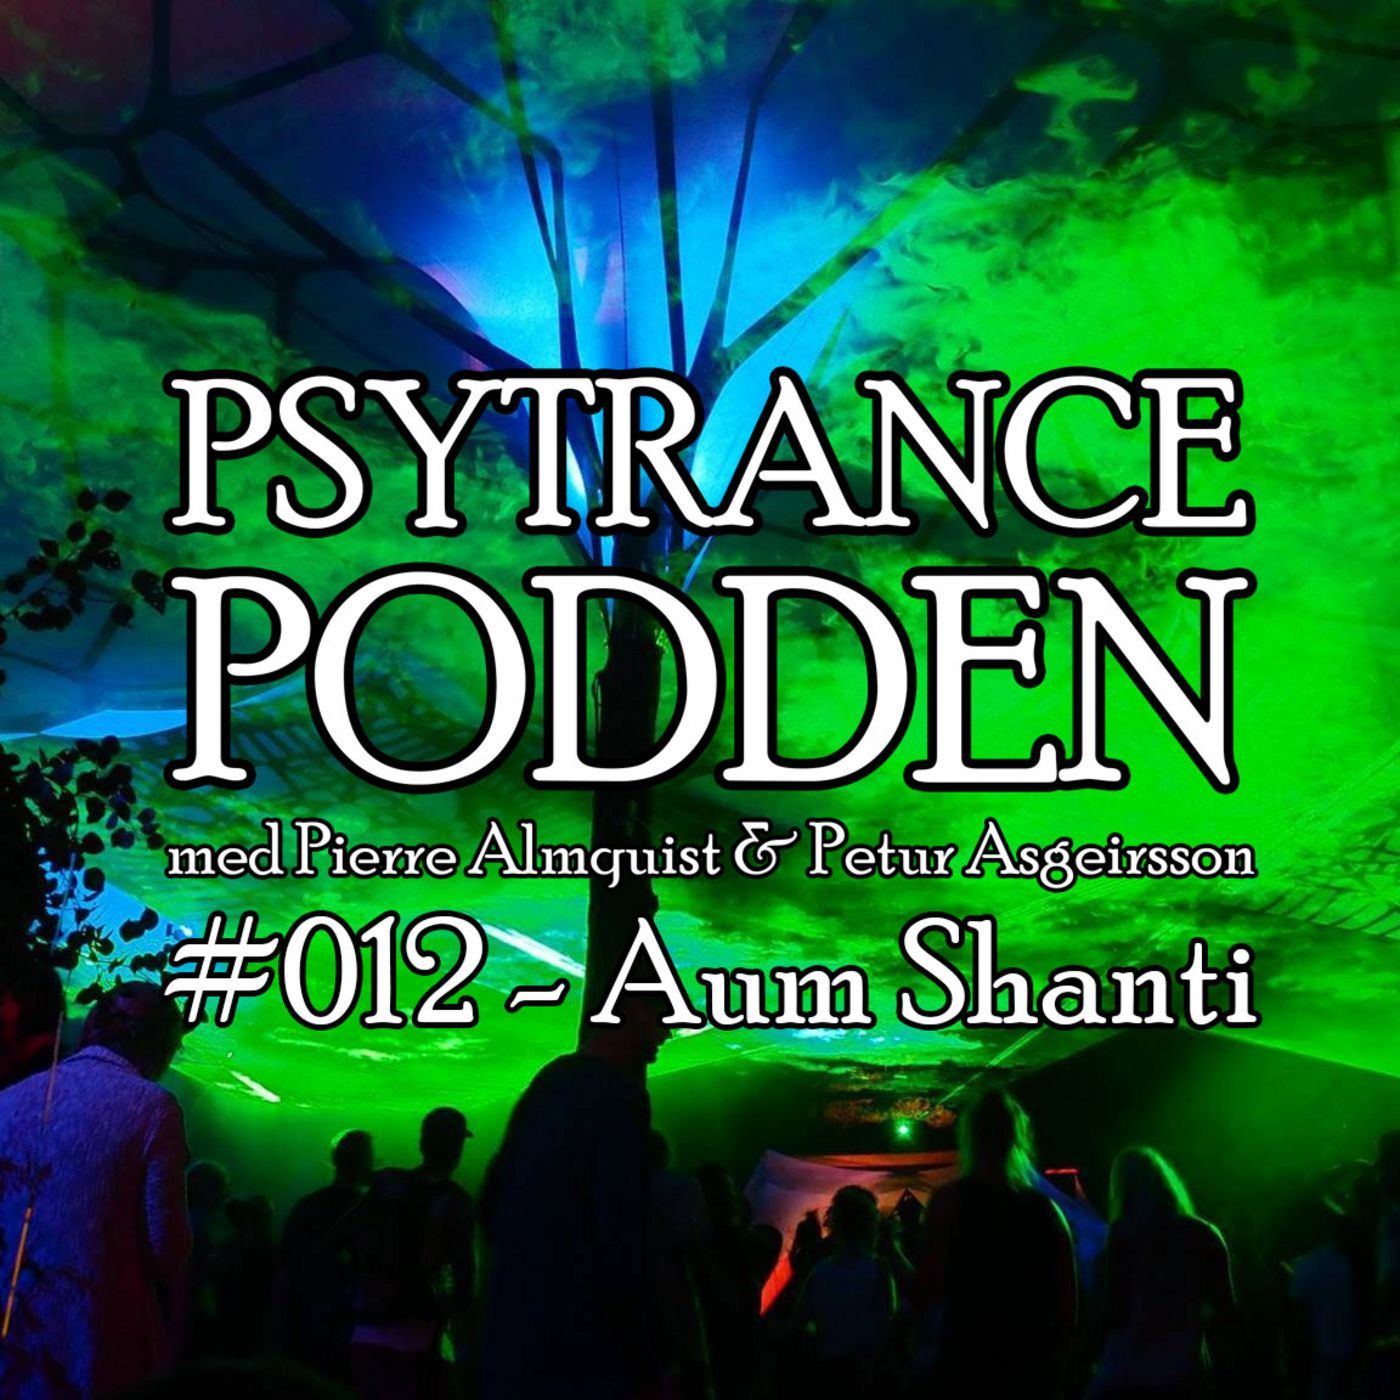 #012 - Aum Shanti